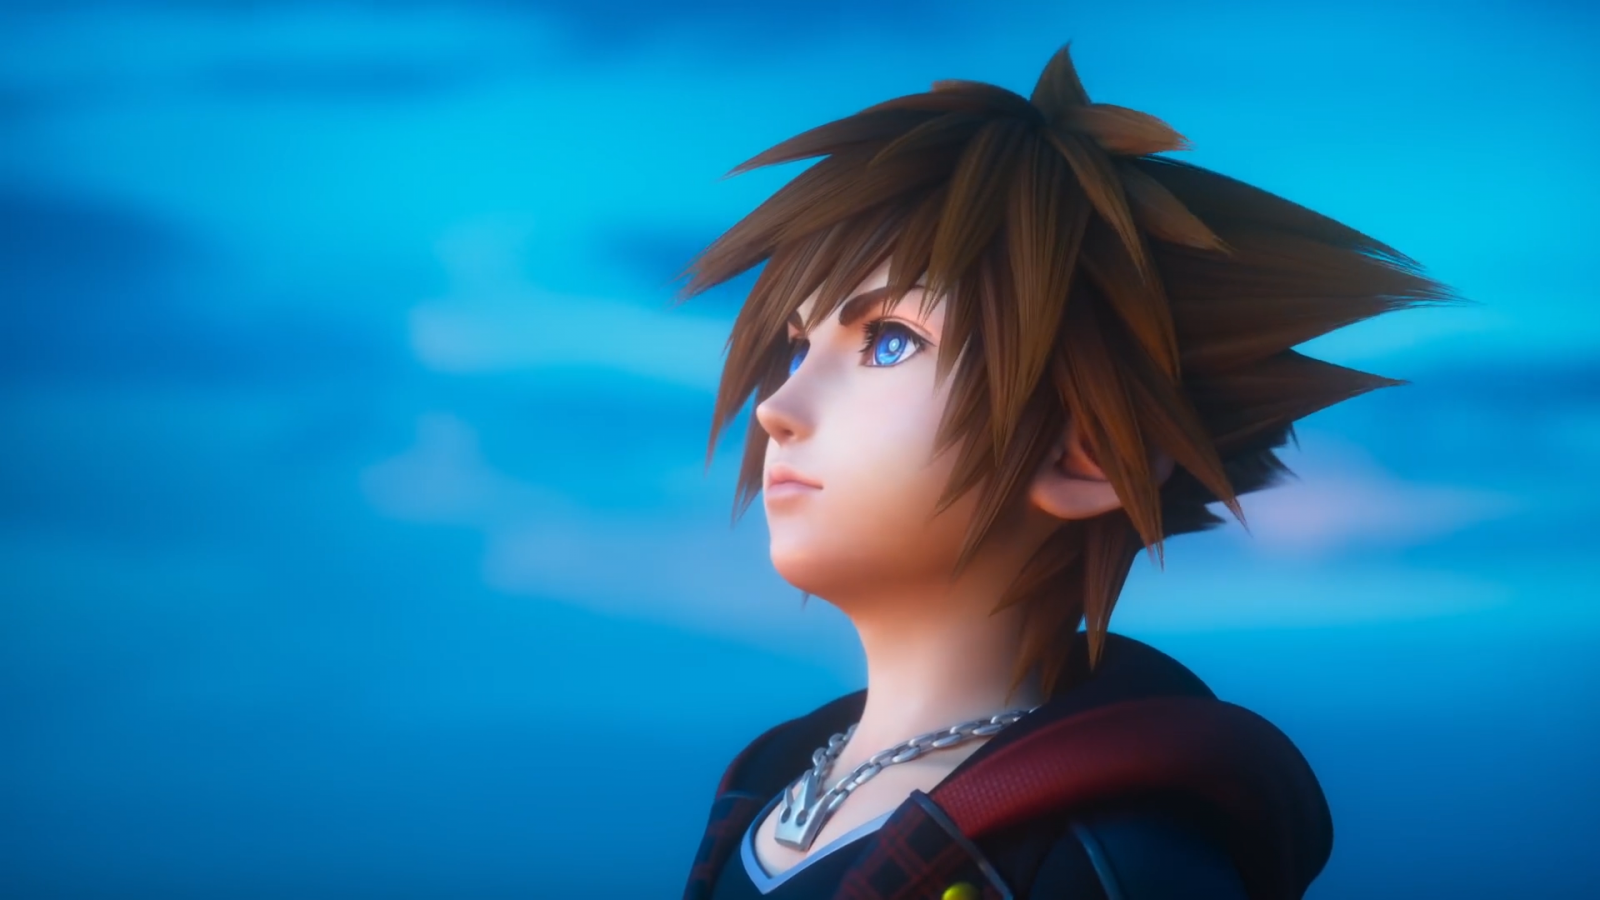 Kingdom Hearts III Opening Movie Trailer